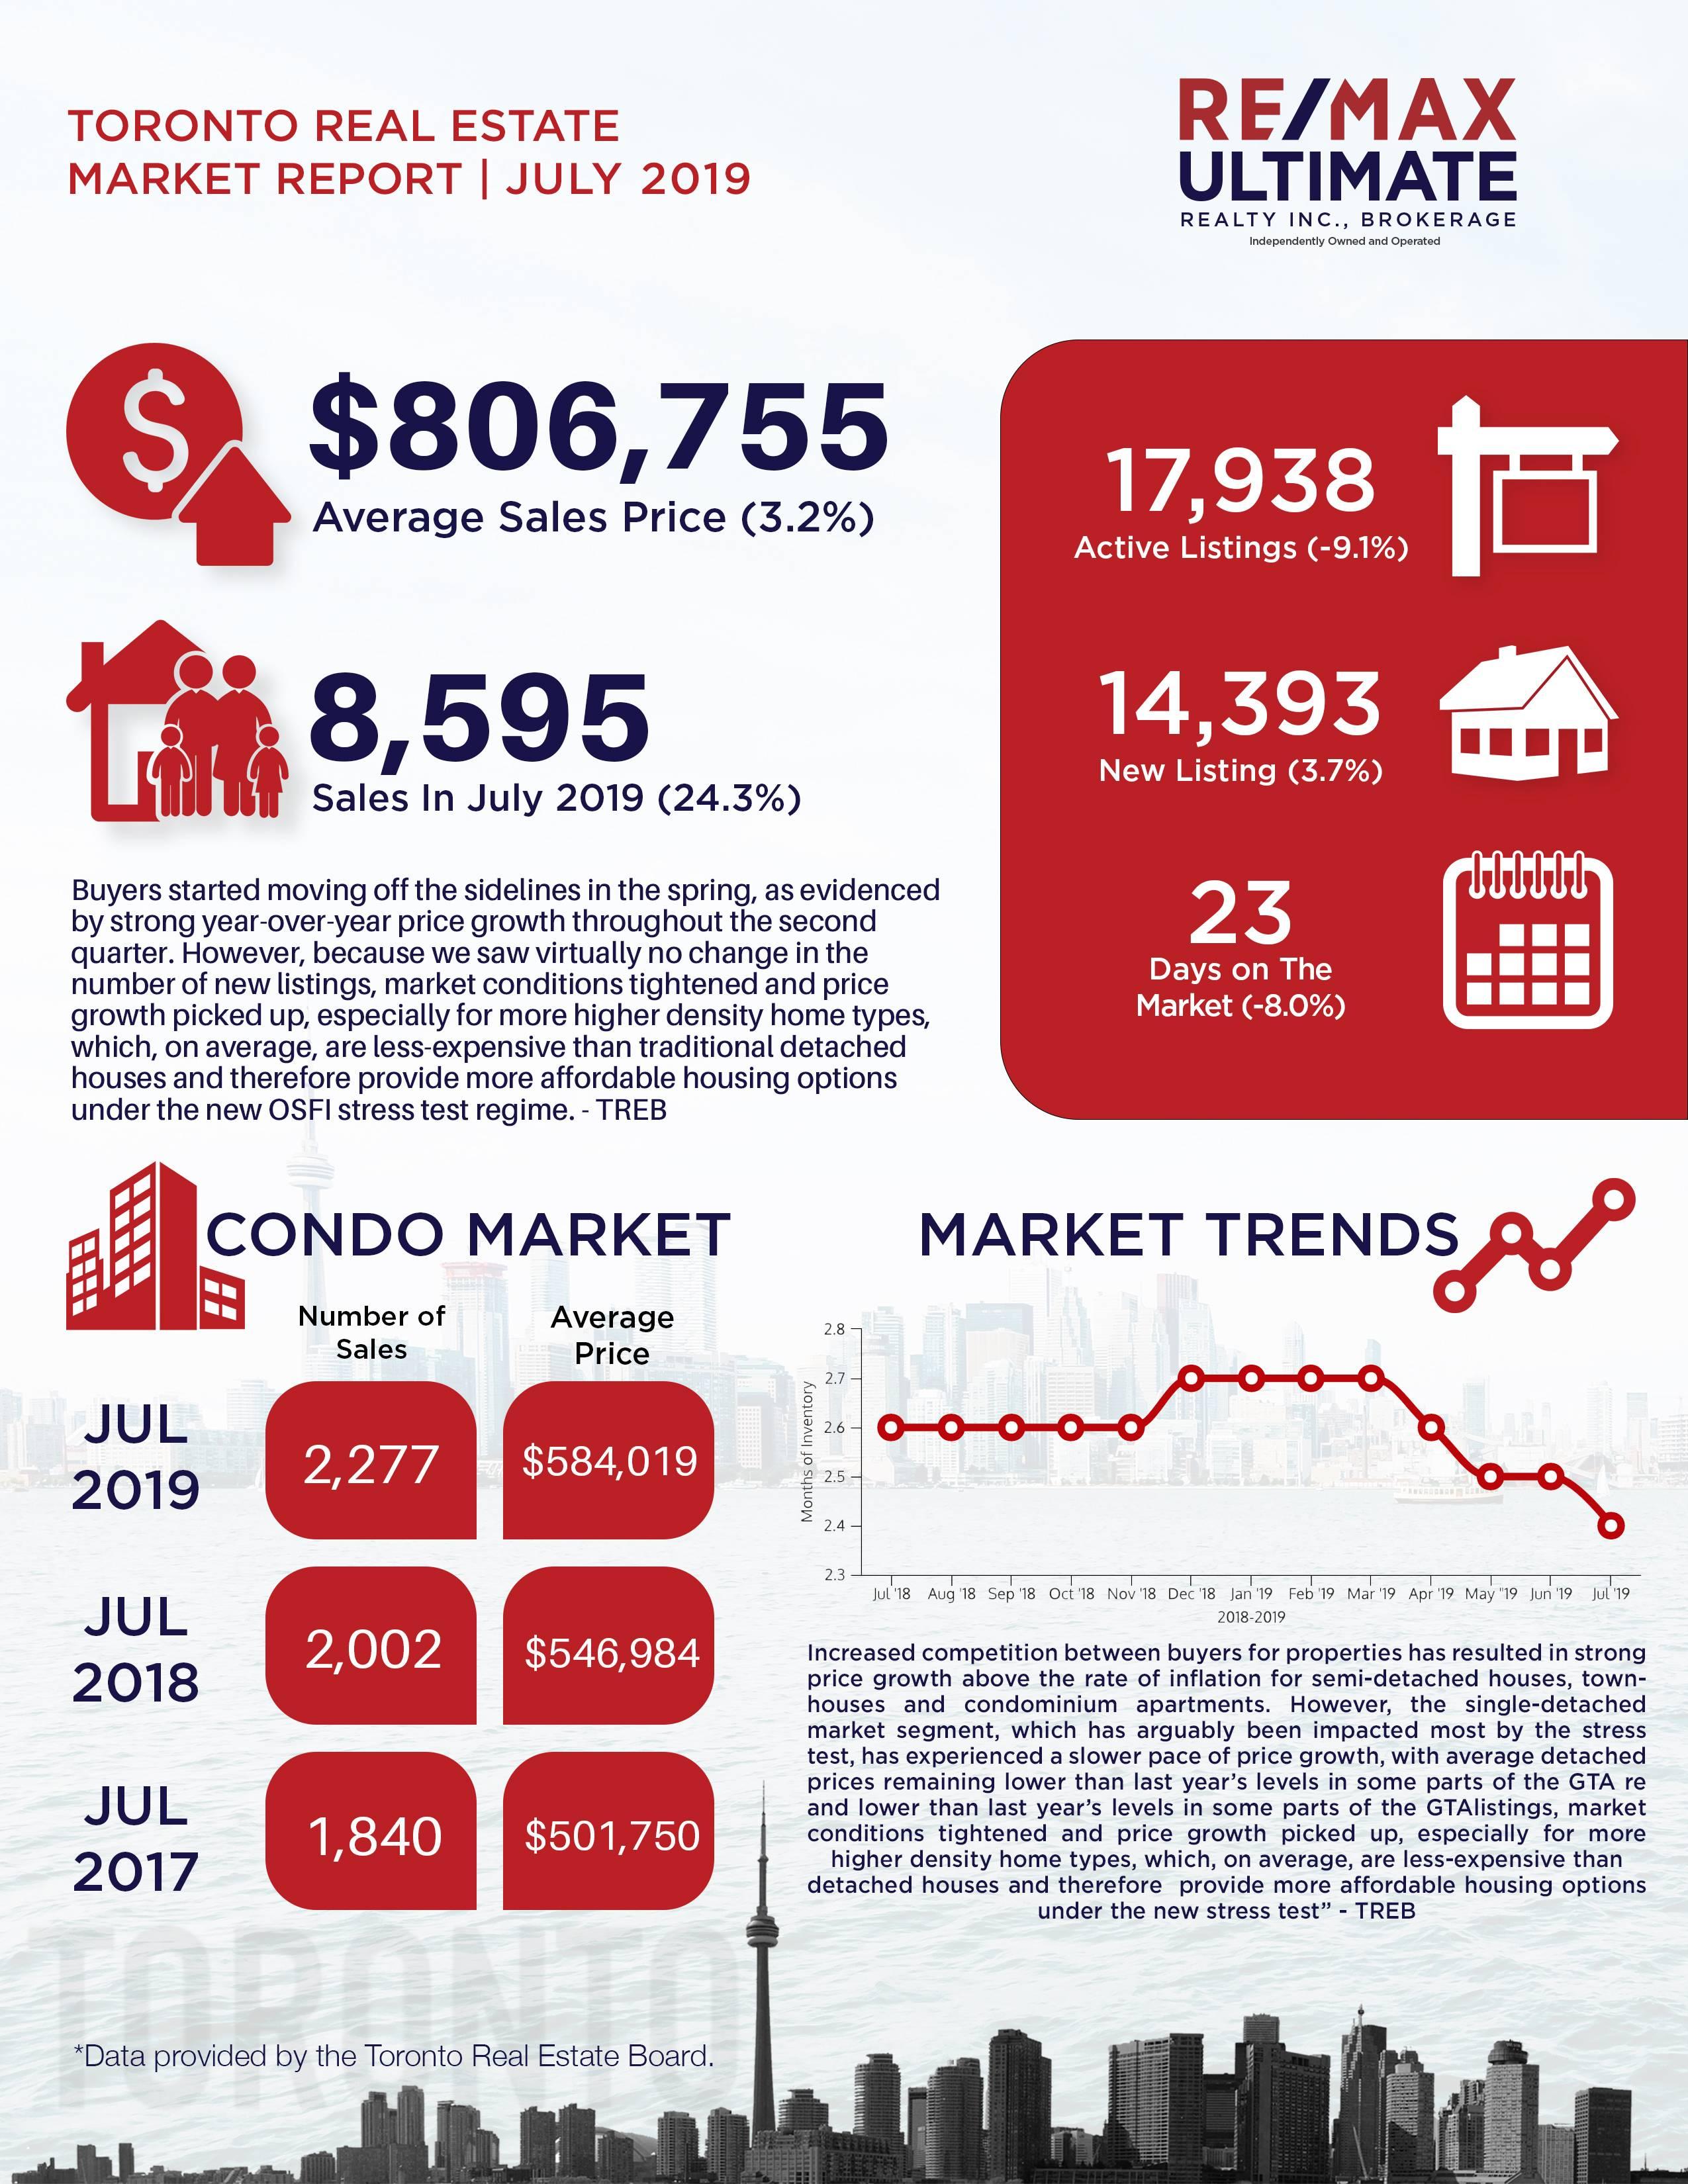 July 2019 Market Statistics